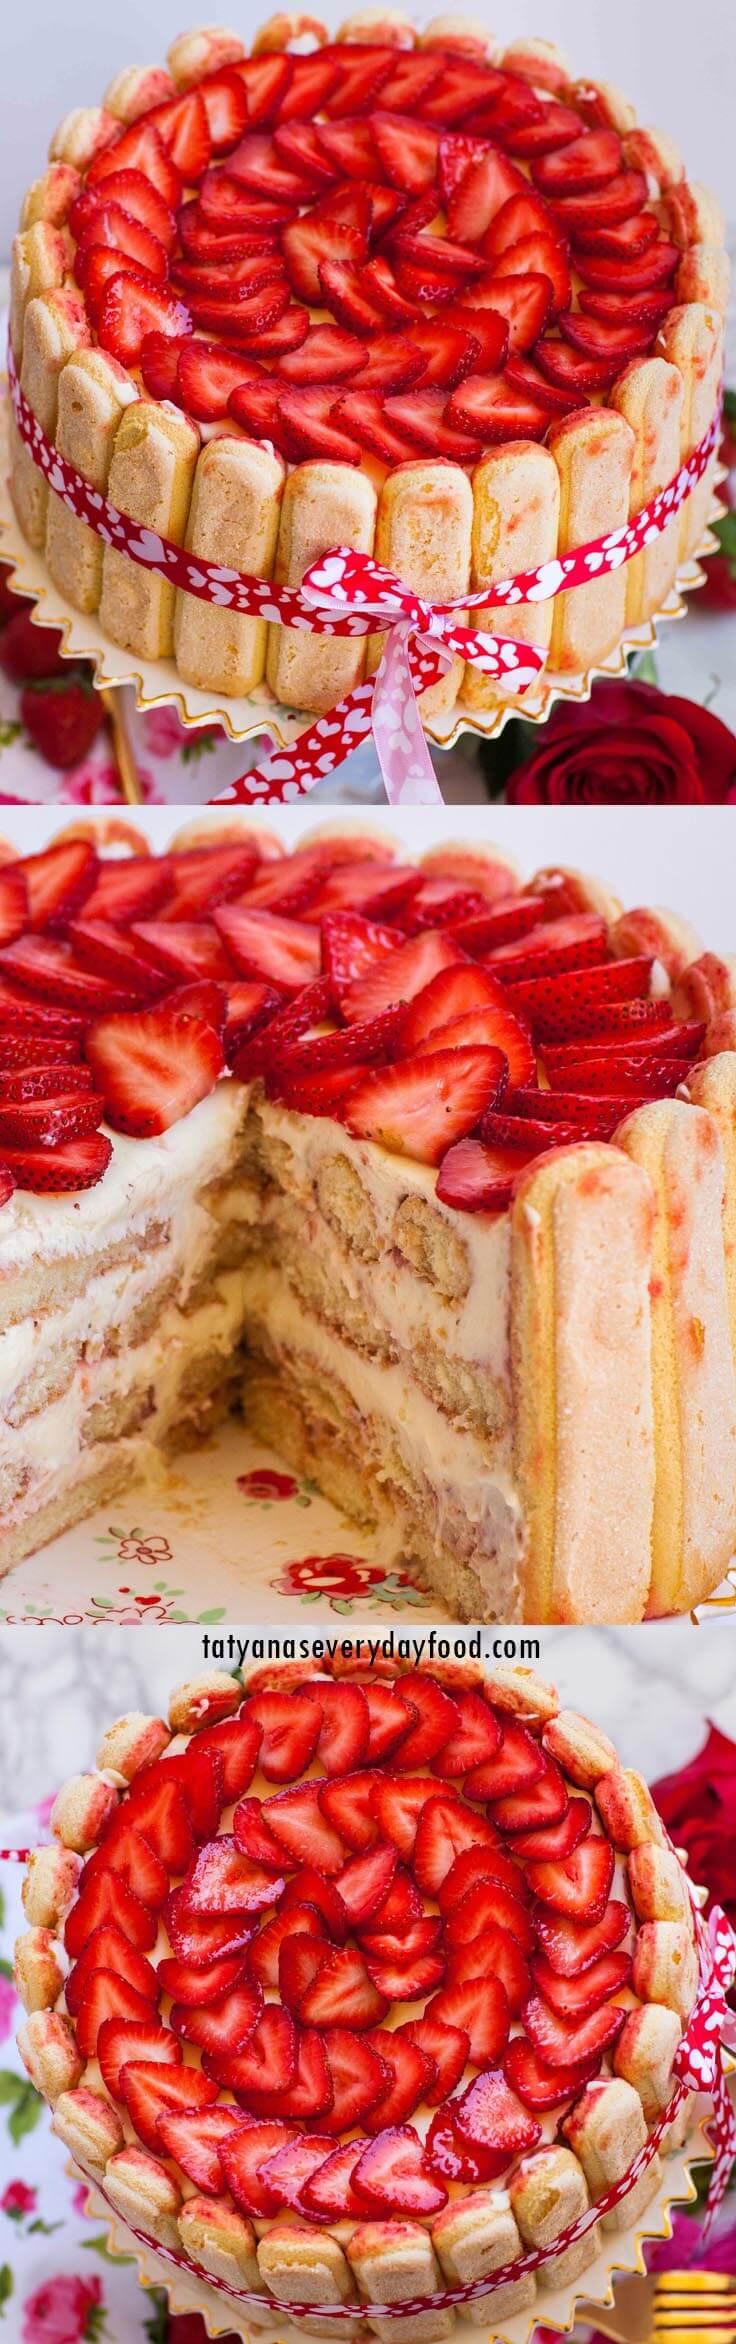 Strawberry Tiramisu Cake video recipe